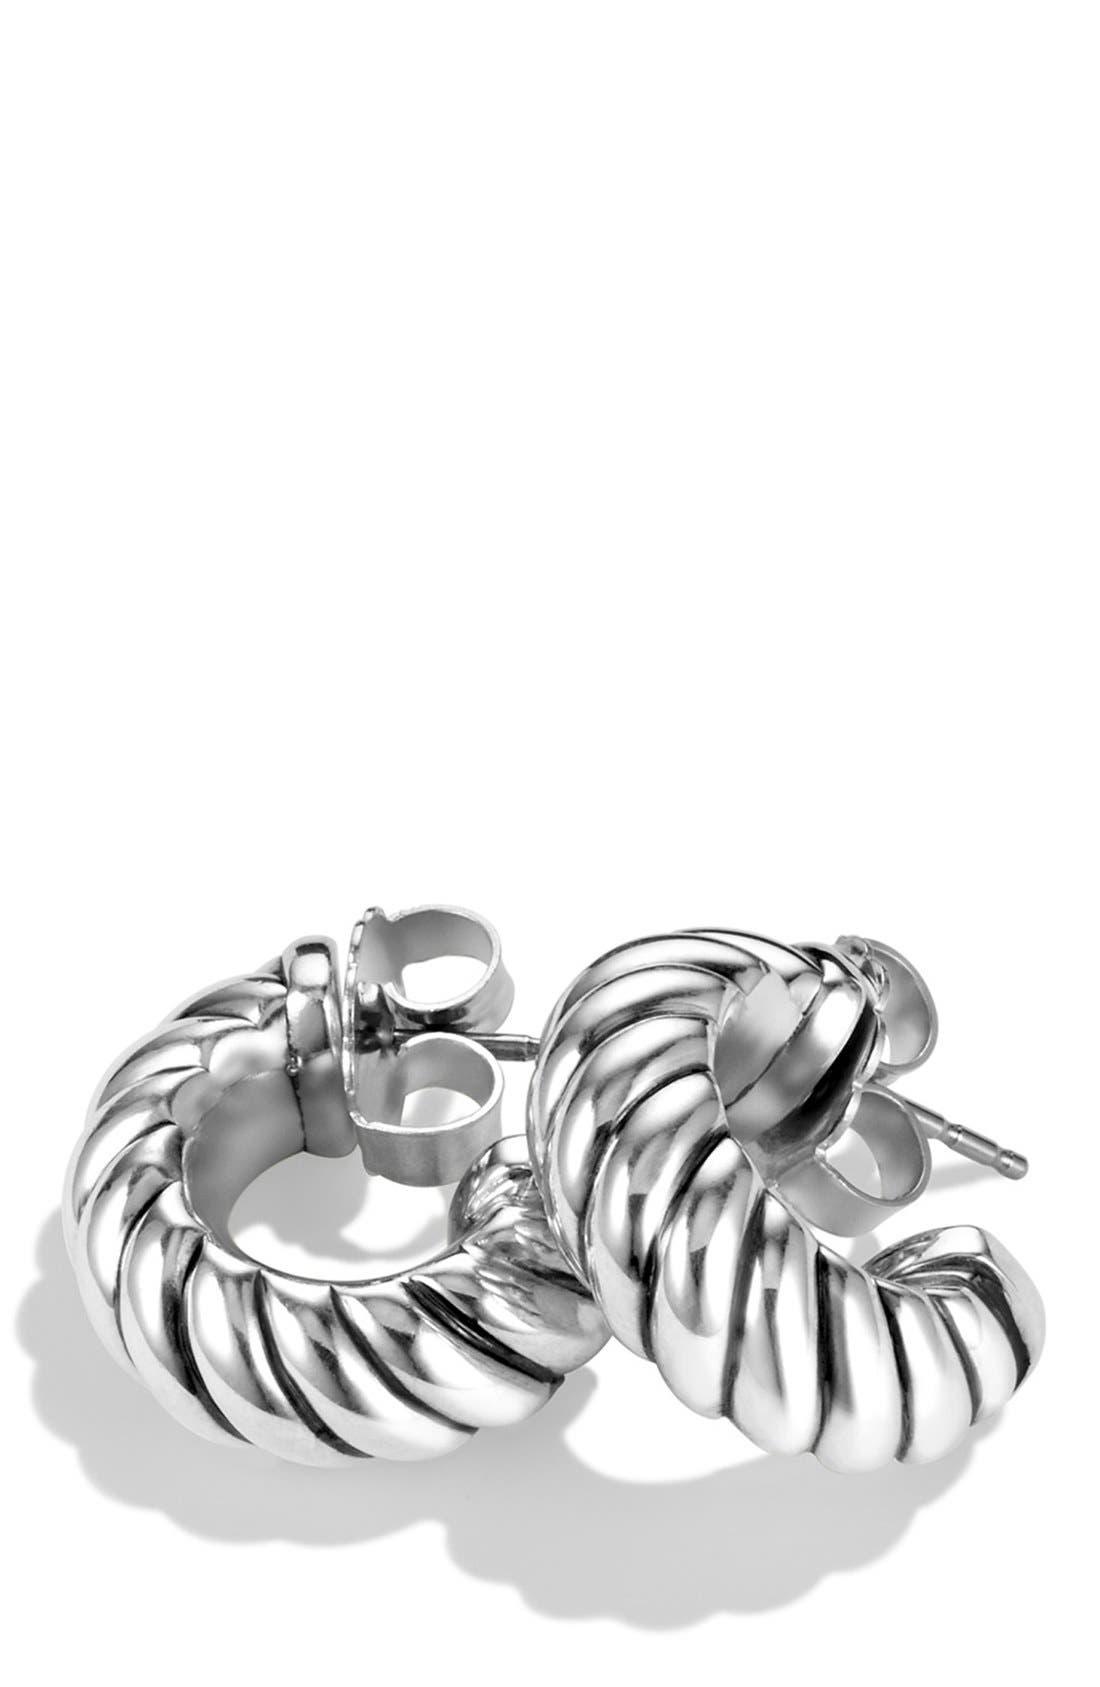 'Cable Classics' Shrimp Earrings,                             Alternate thumbnail 3, color,                             SILVER